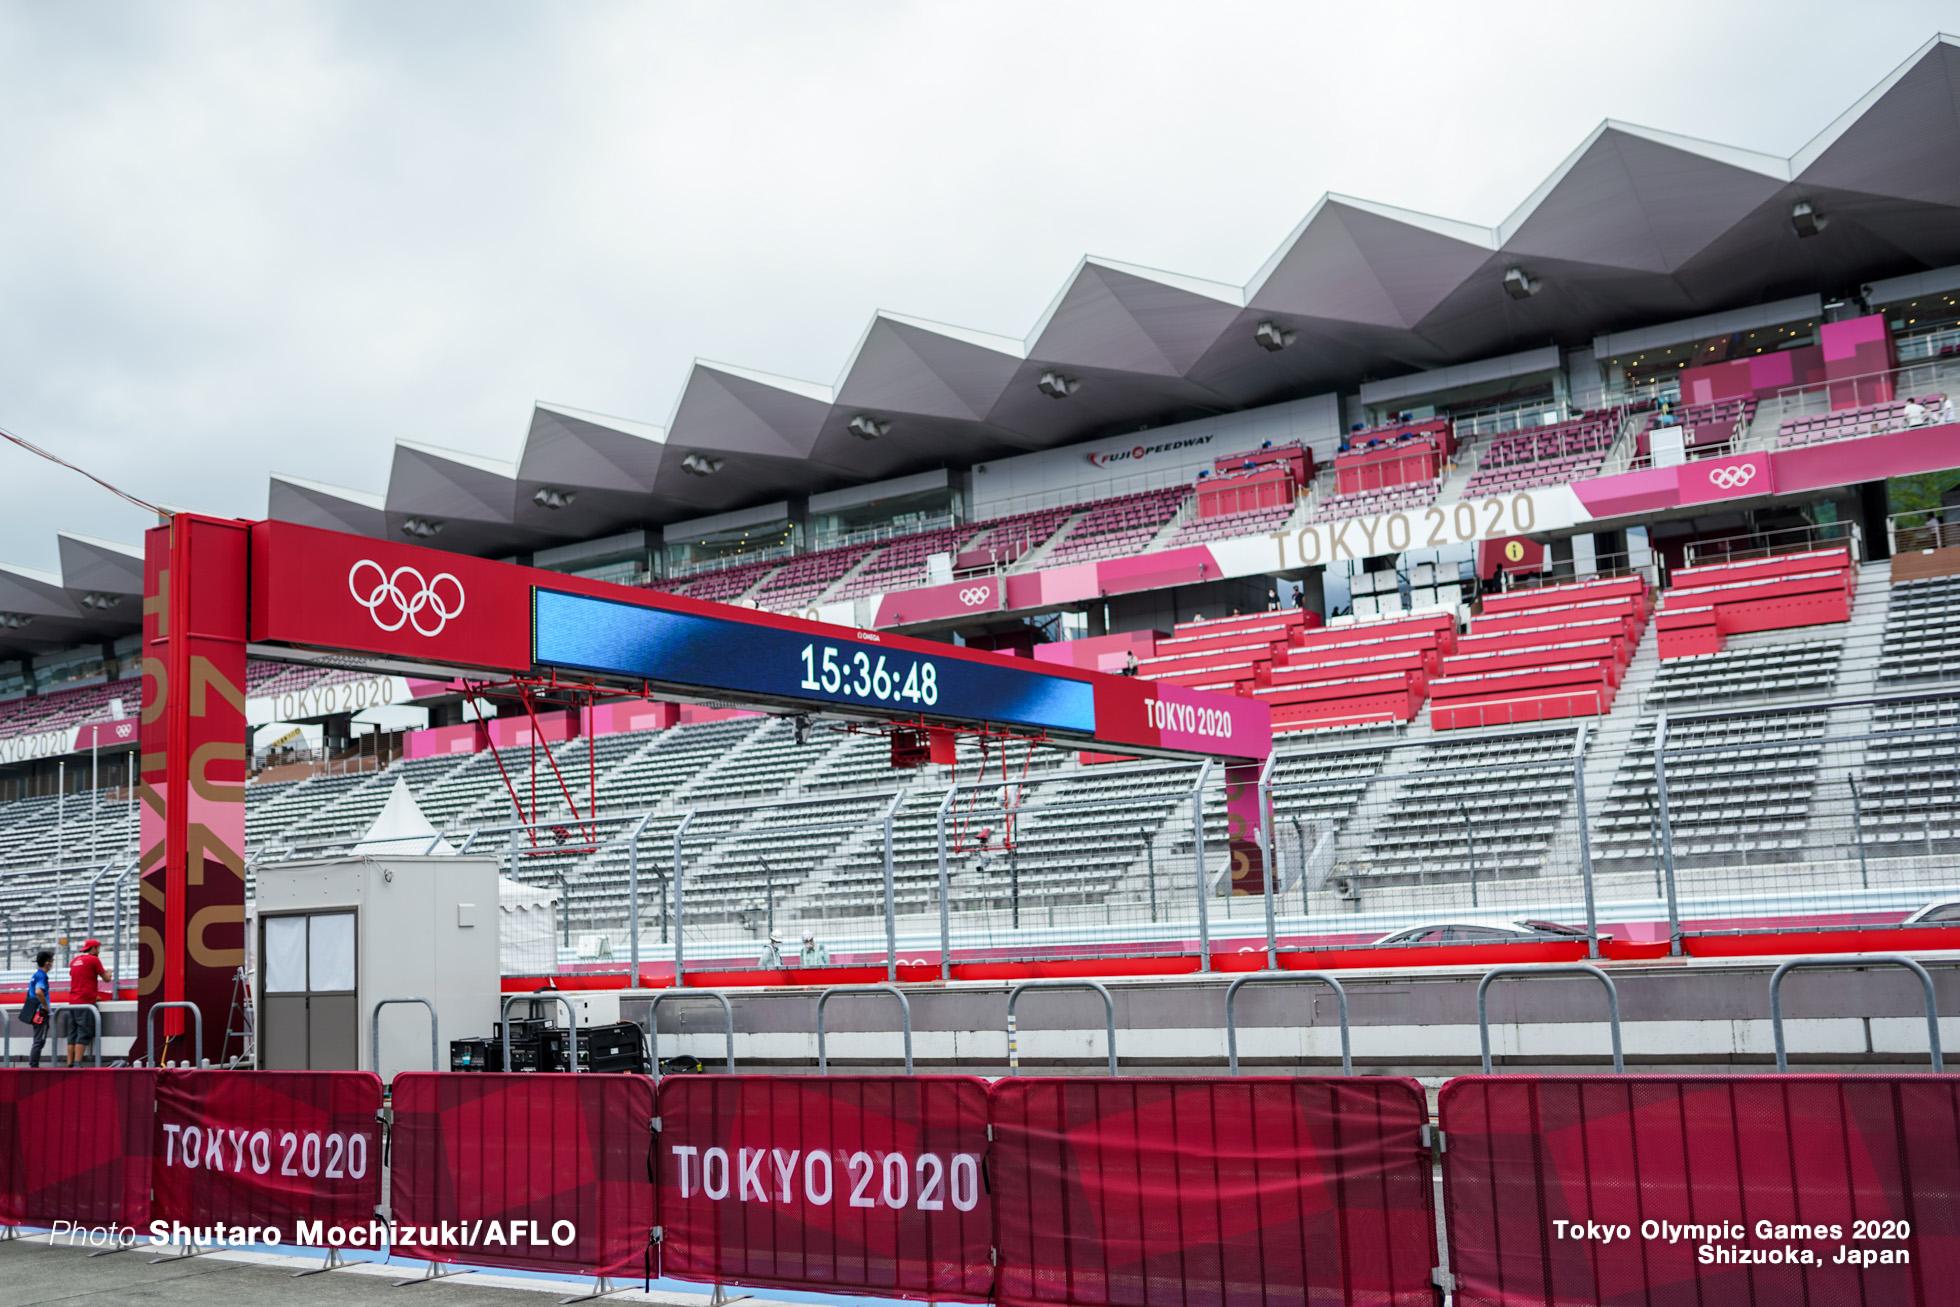 JULY 23, 2021 - Cycling : Men's Road Race during the Tokyo 2020 Olympic Games at 富士スピードウェイ/the Fuji International Speedway in Shizuoka, Japan. (Photo by Shutaro Mochizuki/AFLO)